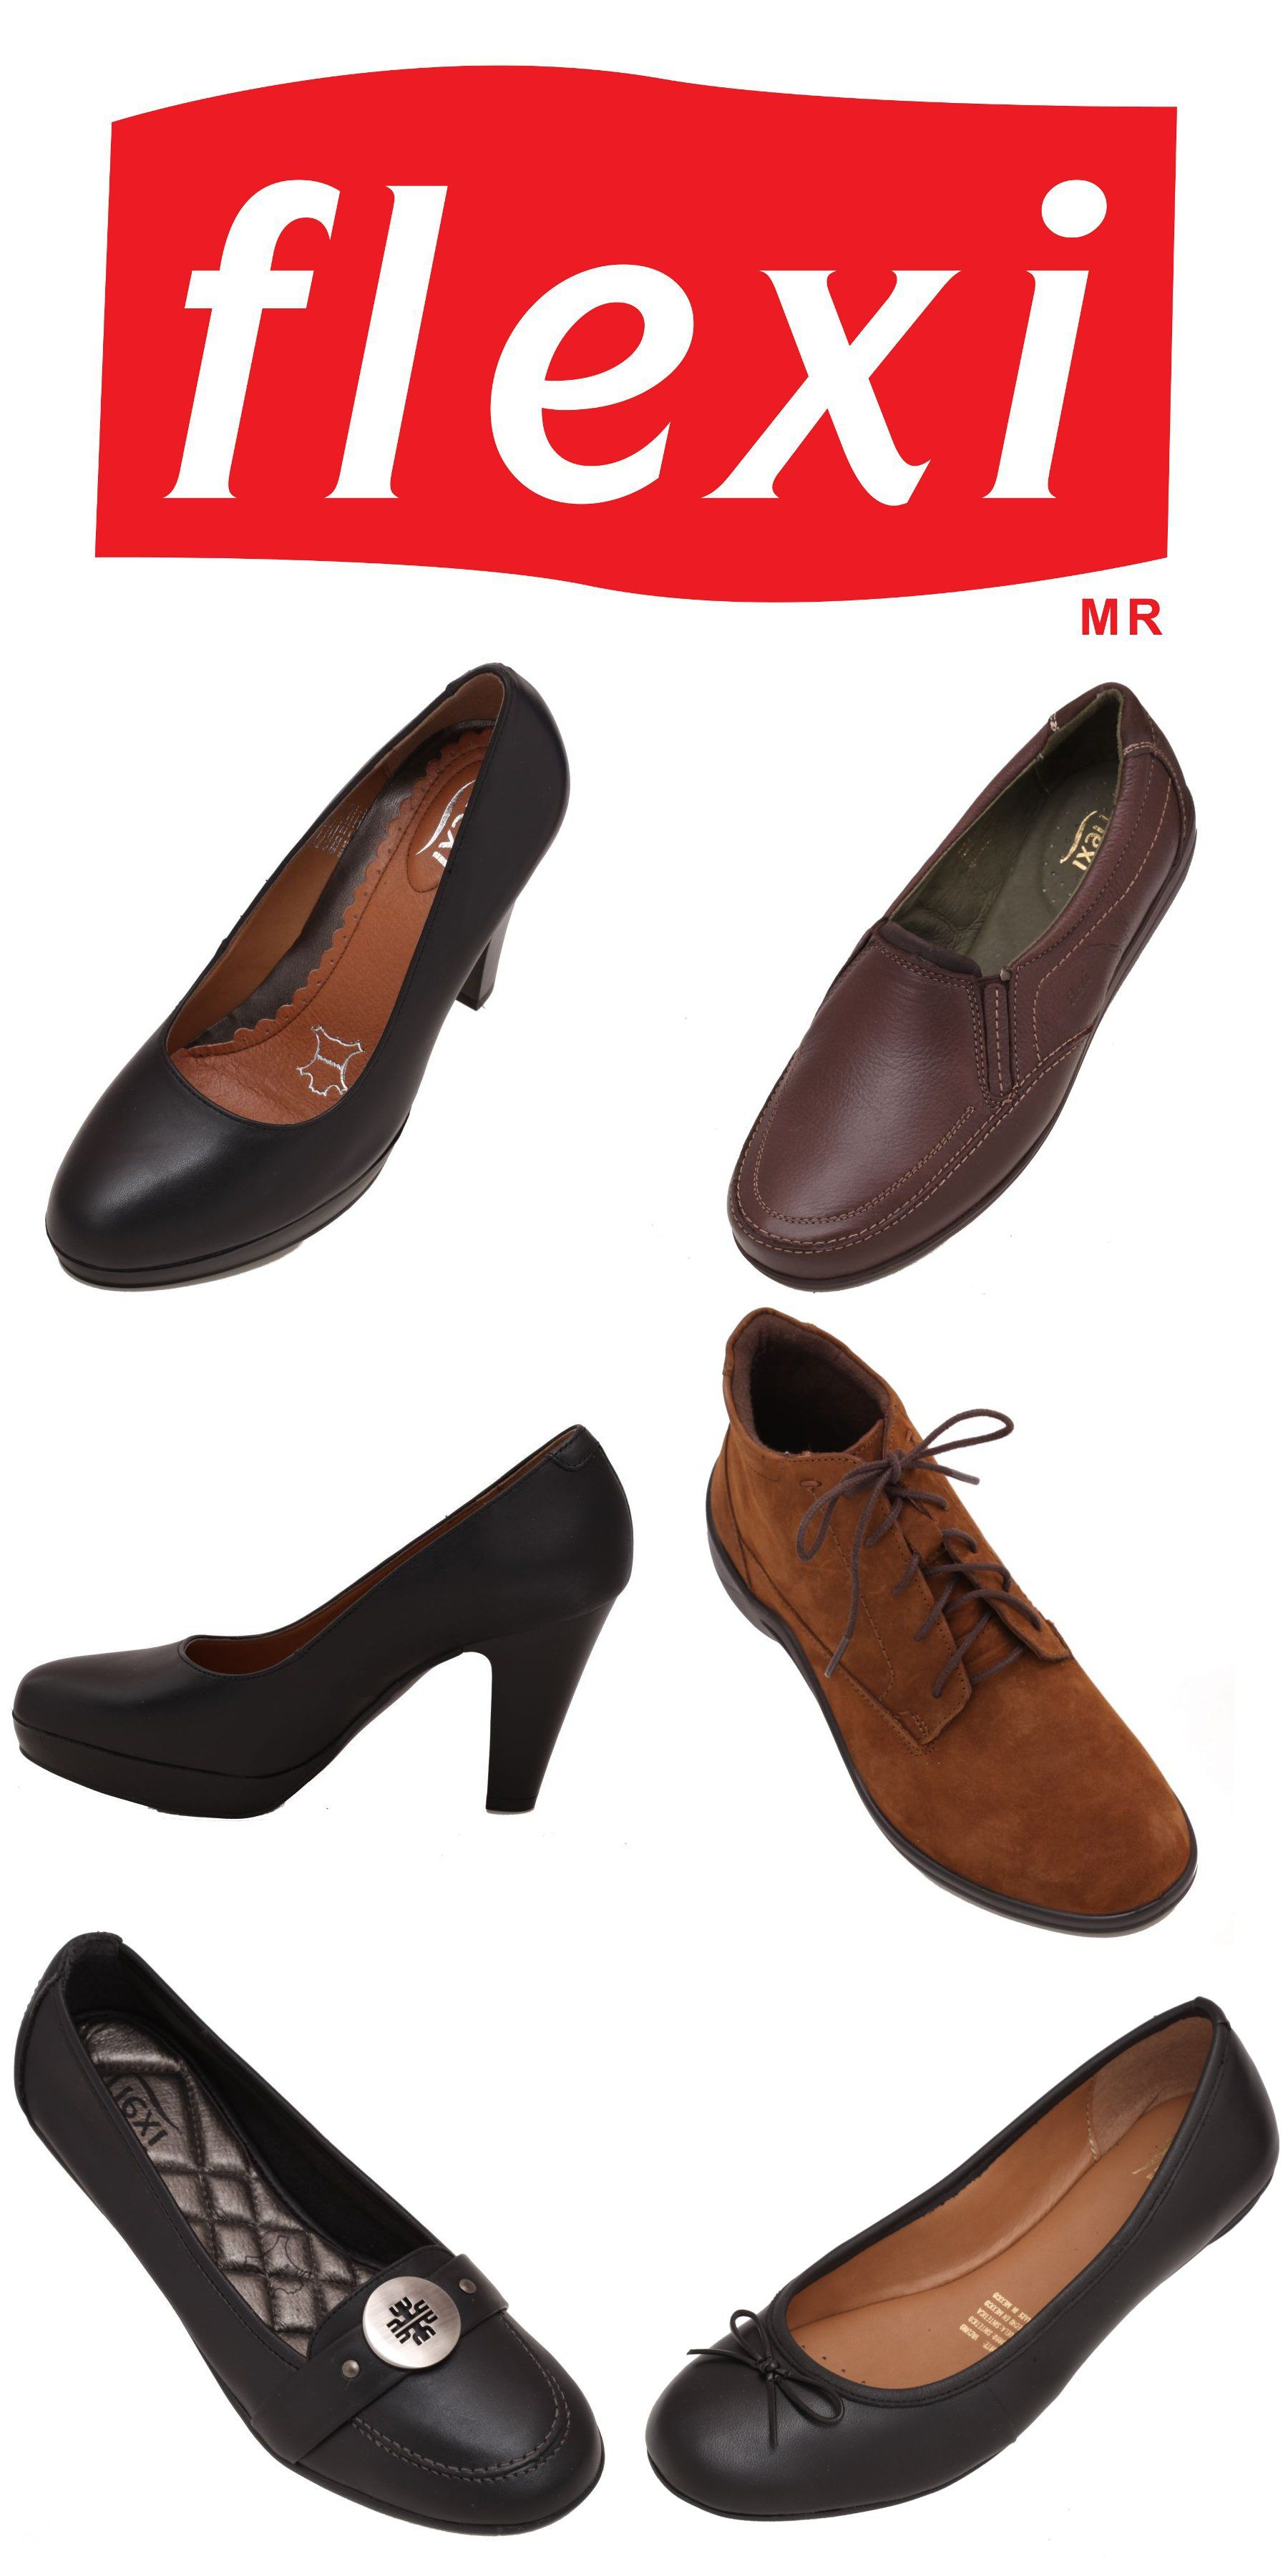 Algunos modelos de zapatos c modos para mujer marca flexi for Zapatos por catalogo